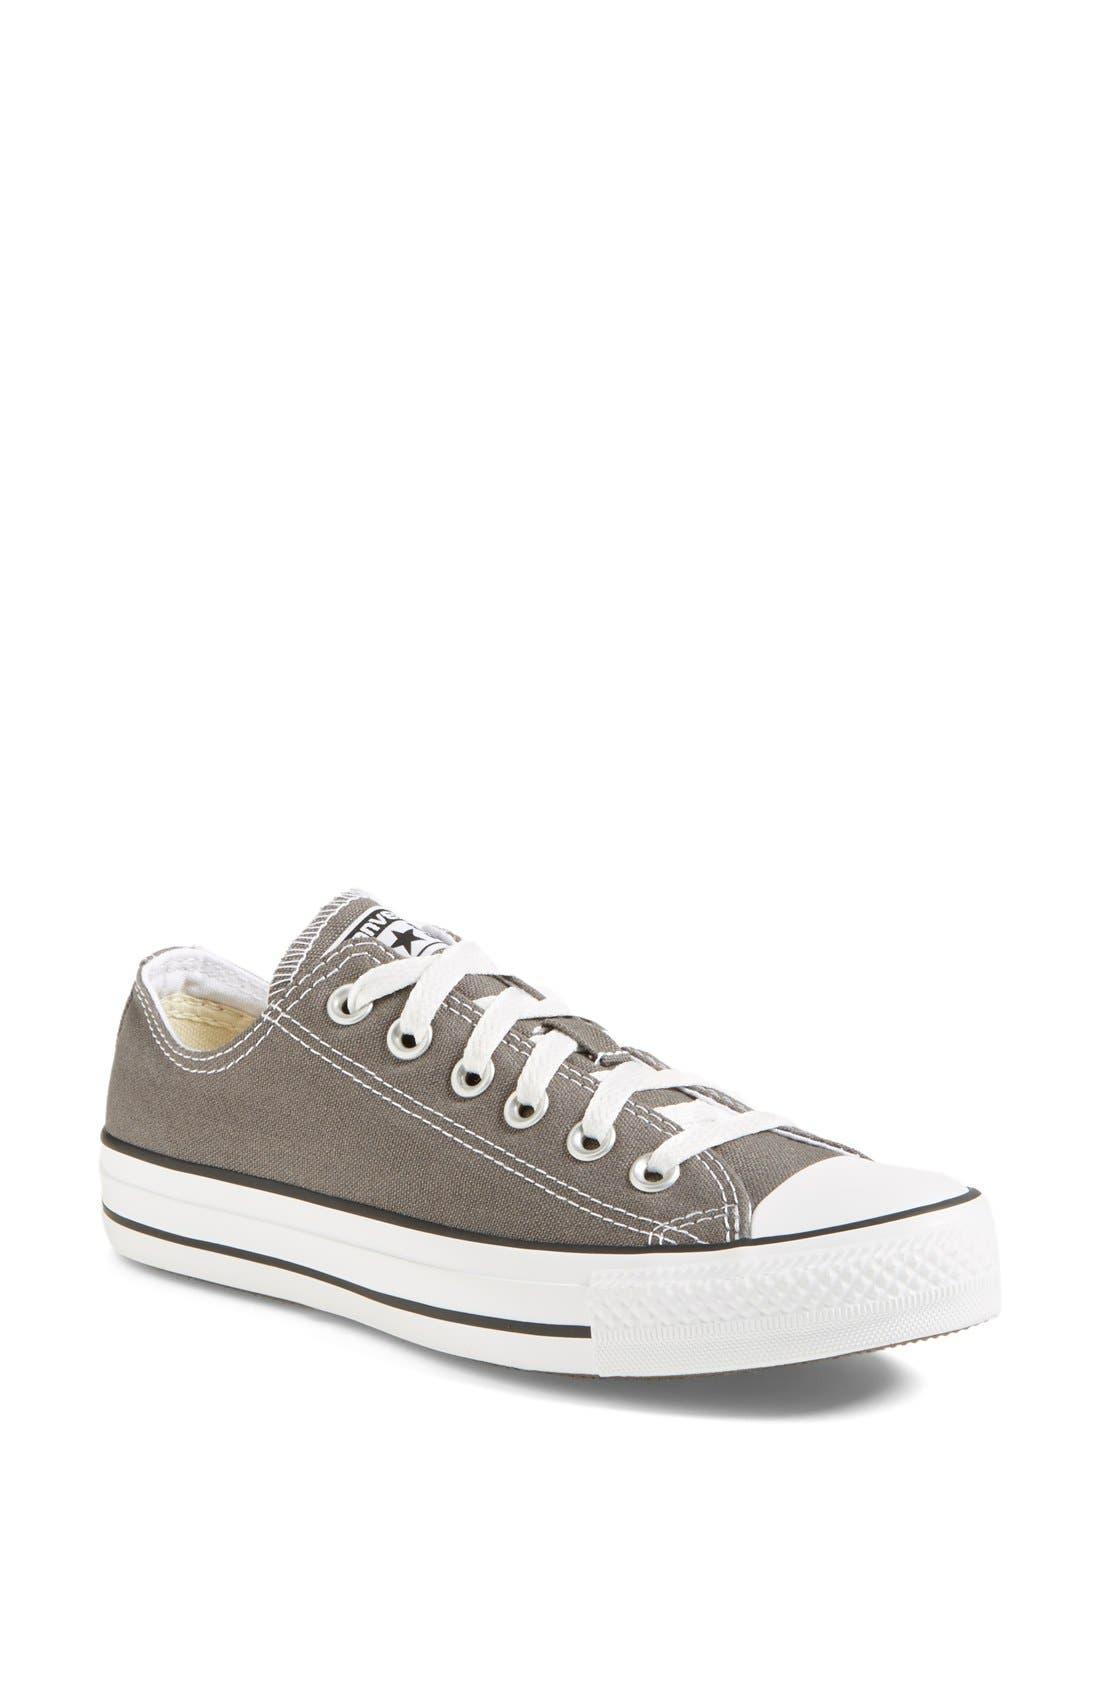 Chuck Taylor<sup>®</sup> Low Sneaker,                             Main thumbnail 1, color,                             Charcoal